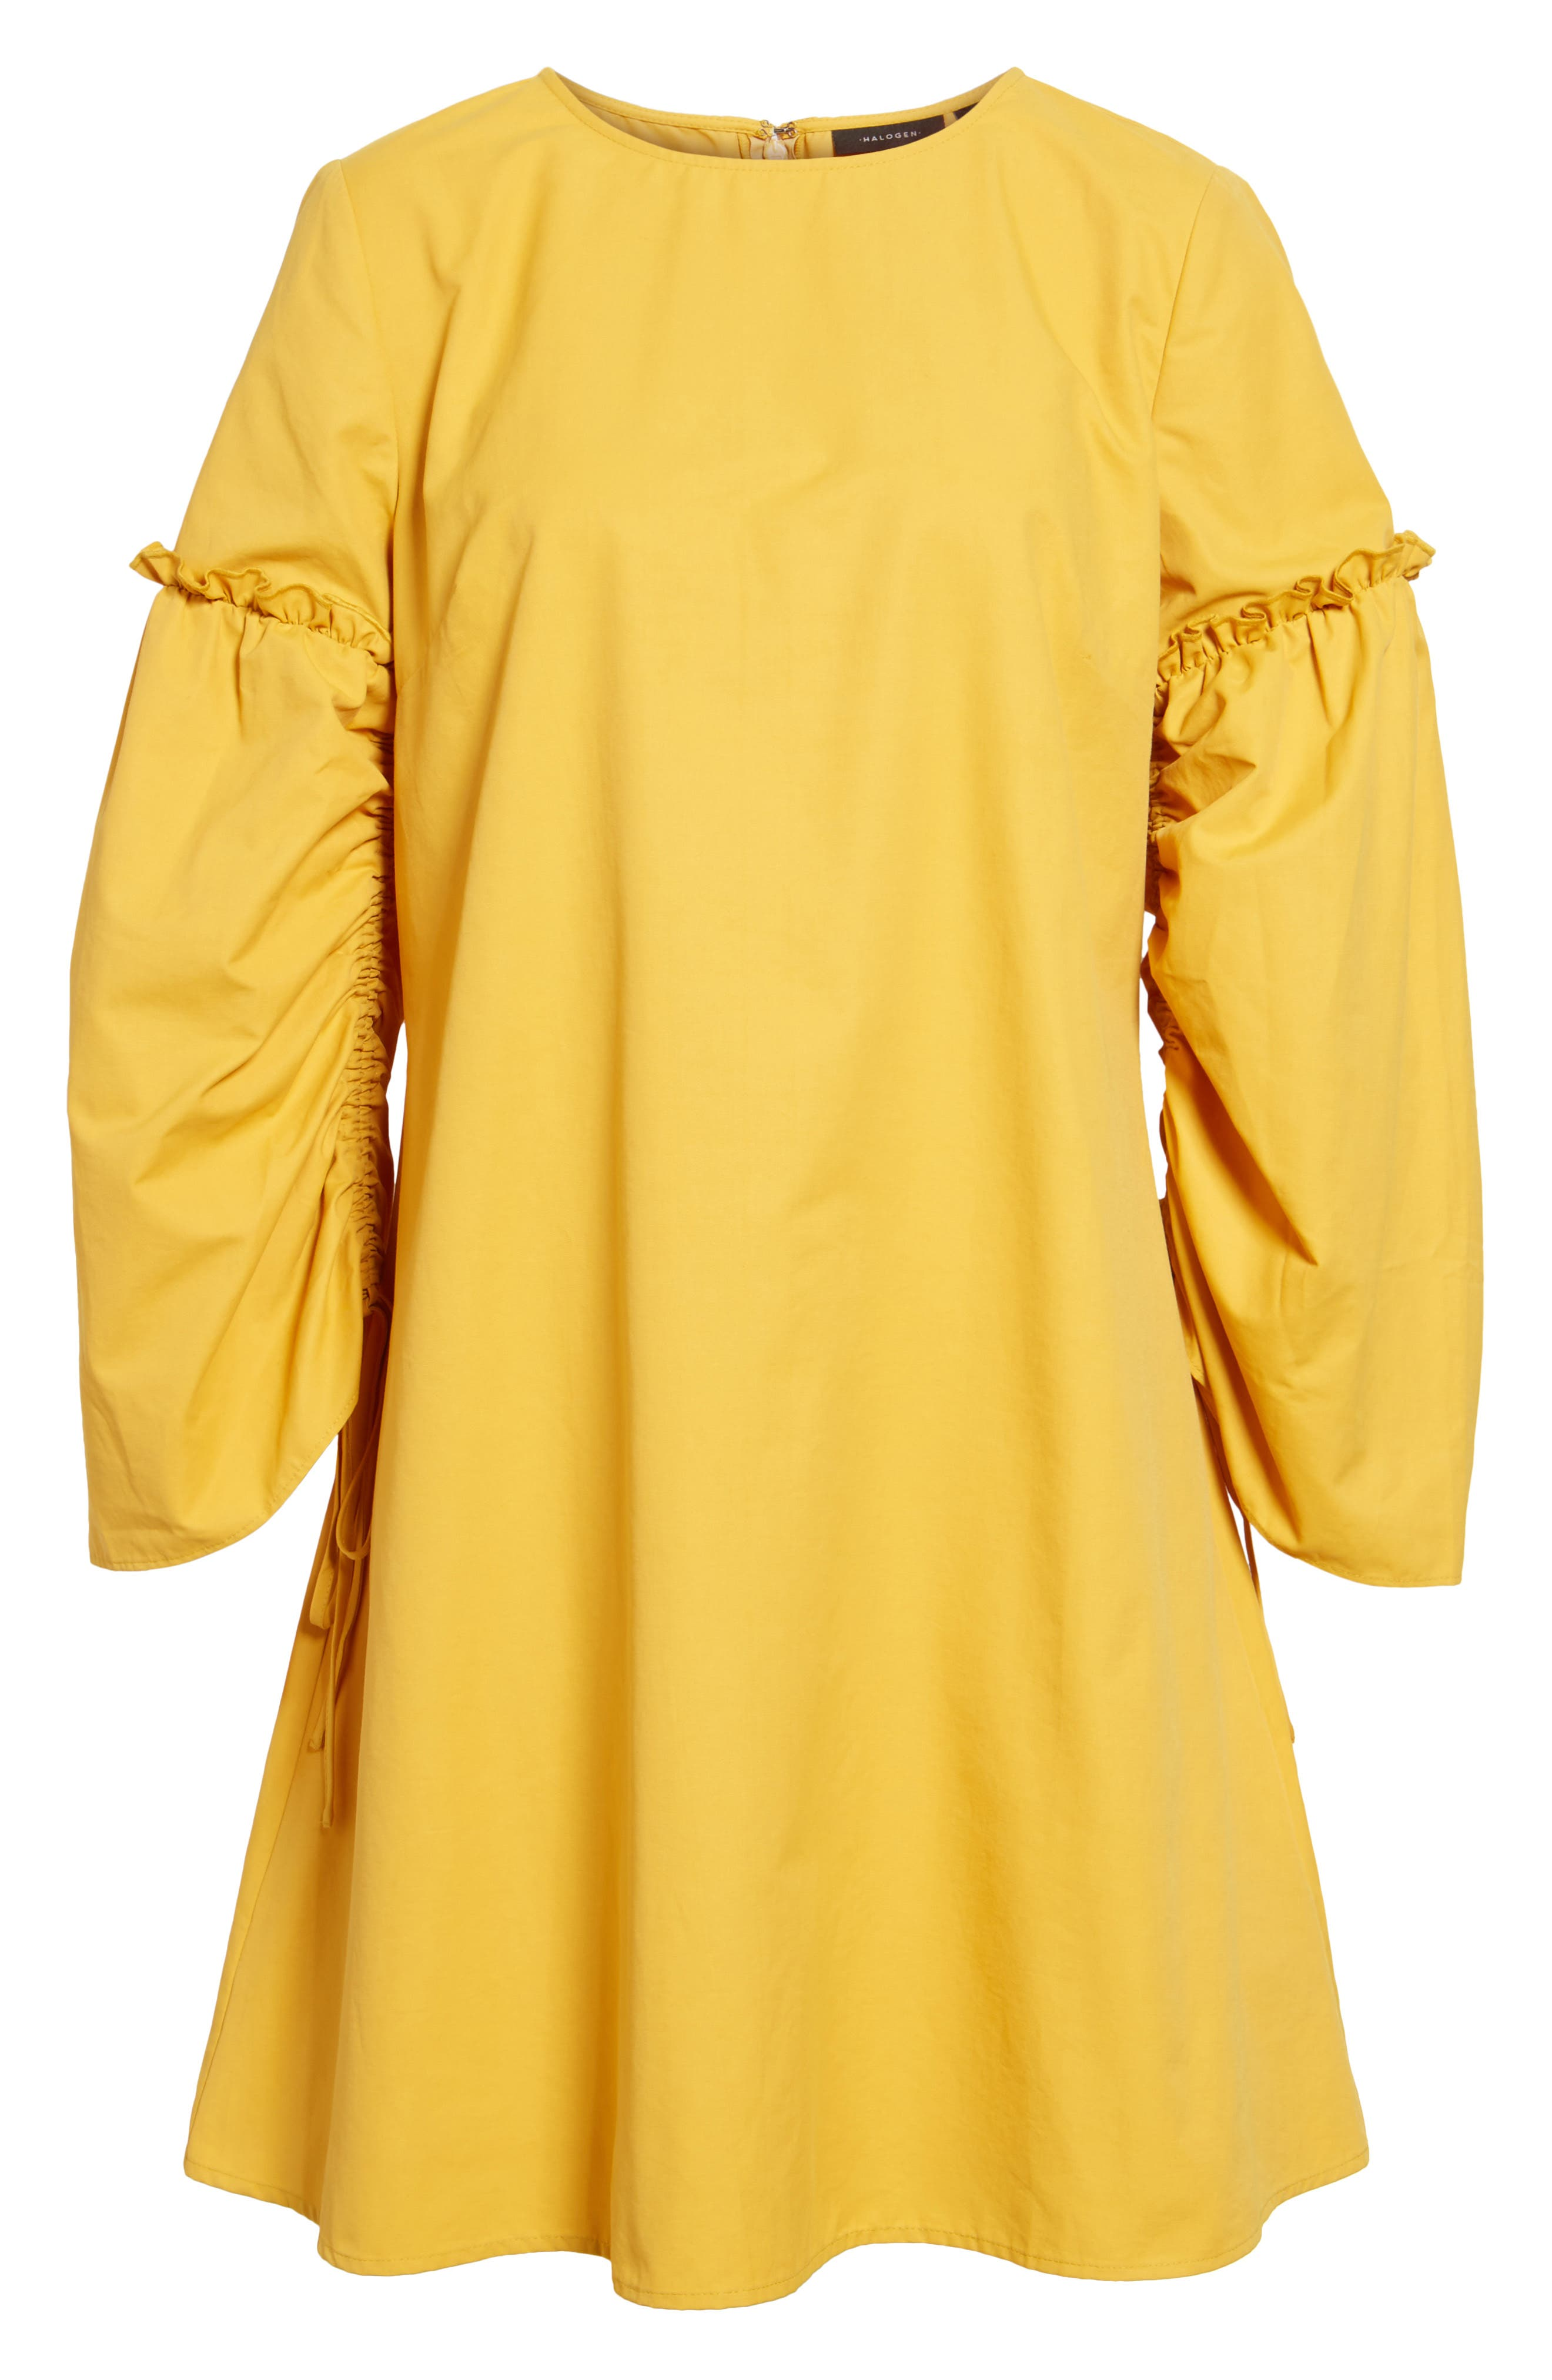 Parachute Sleeve Shift Dress,                             Alternate thumbnail 6, color,                             Yellow Mineral